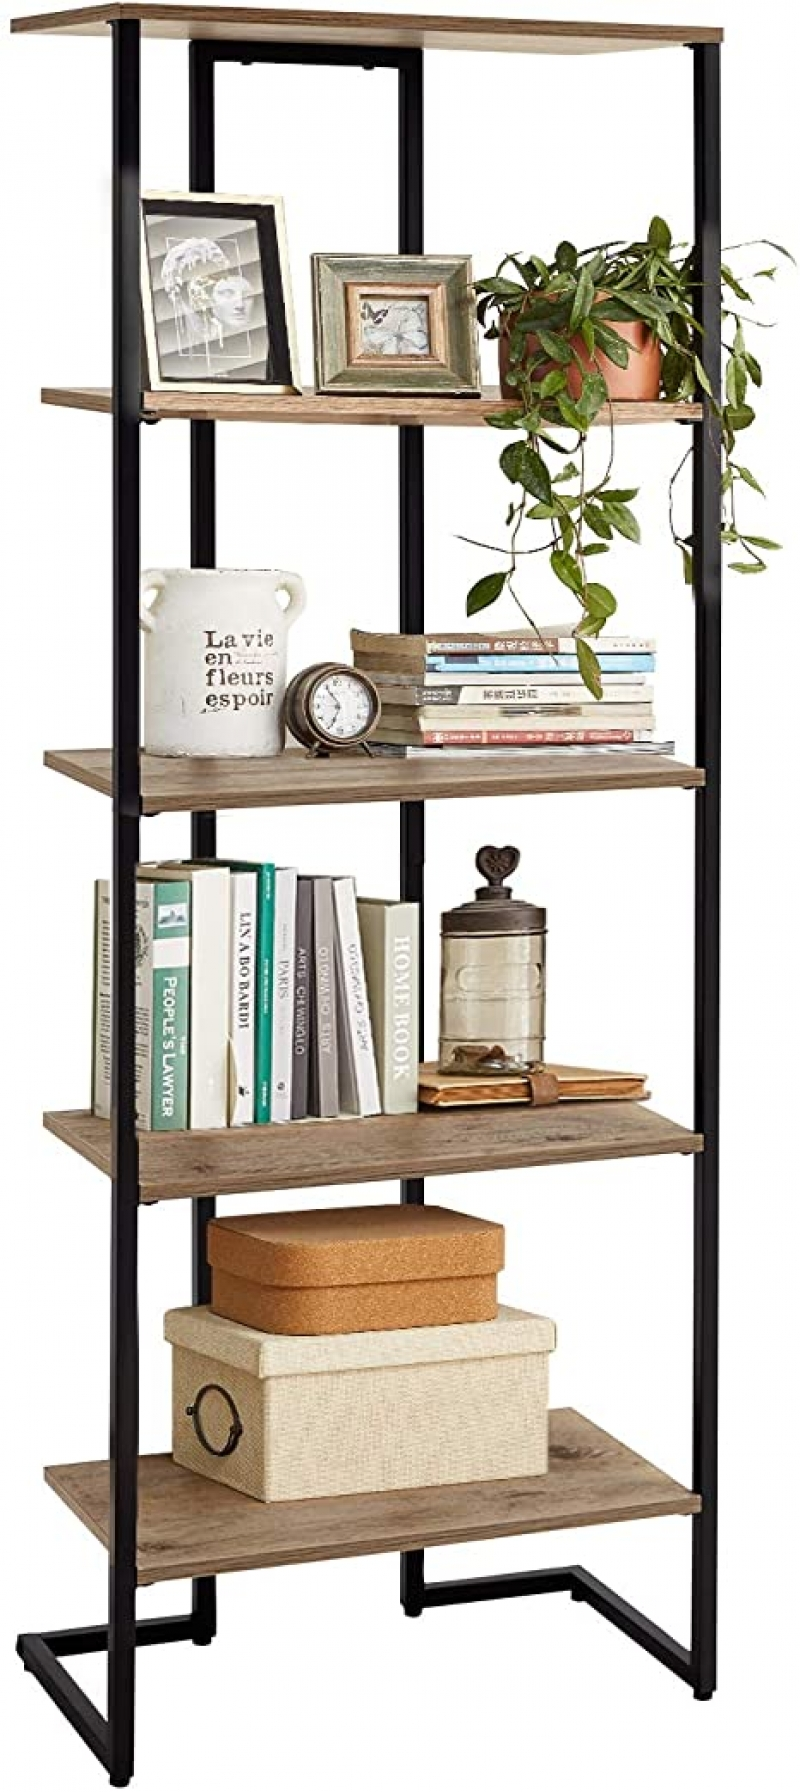 ihocon: Linsy 5-Tier Home Bookshelf with Metal Frames 五層書架